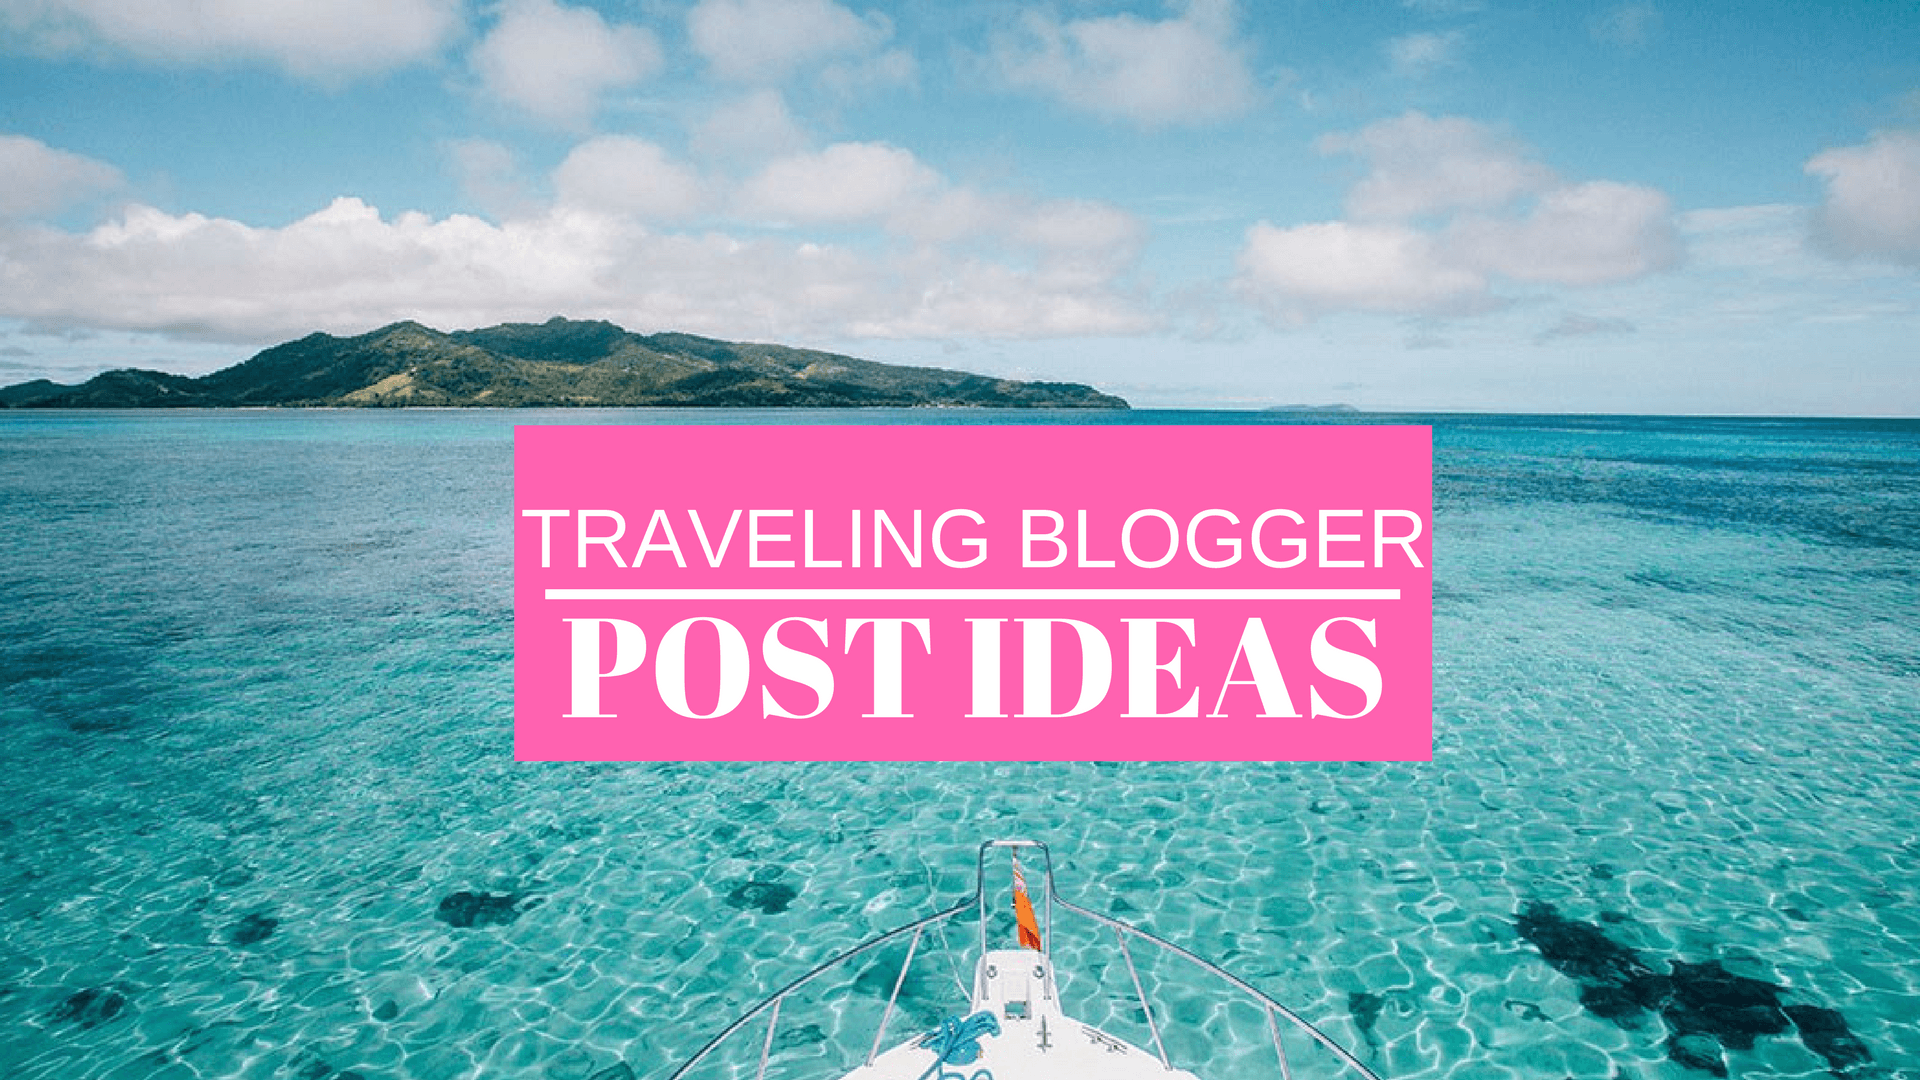 BLOG 101: TRAVELING BLOGGER POST IDEAS